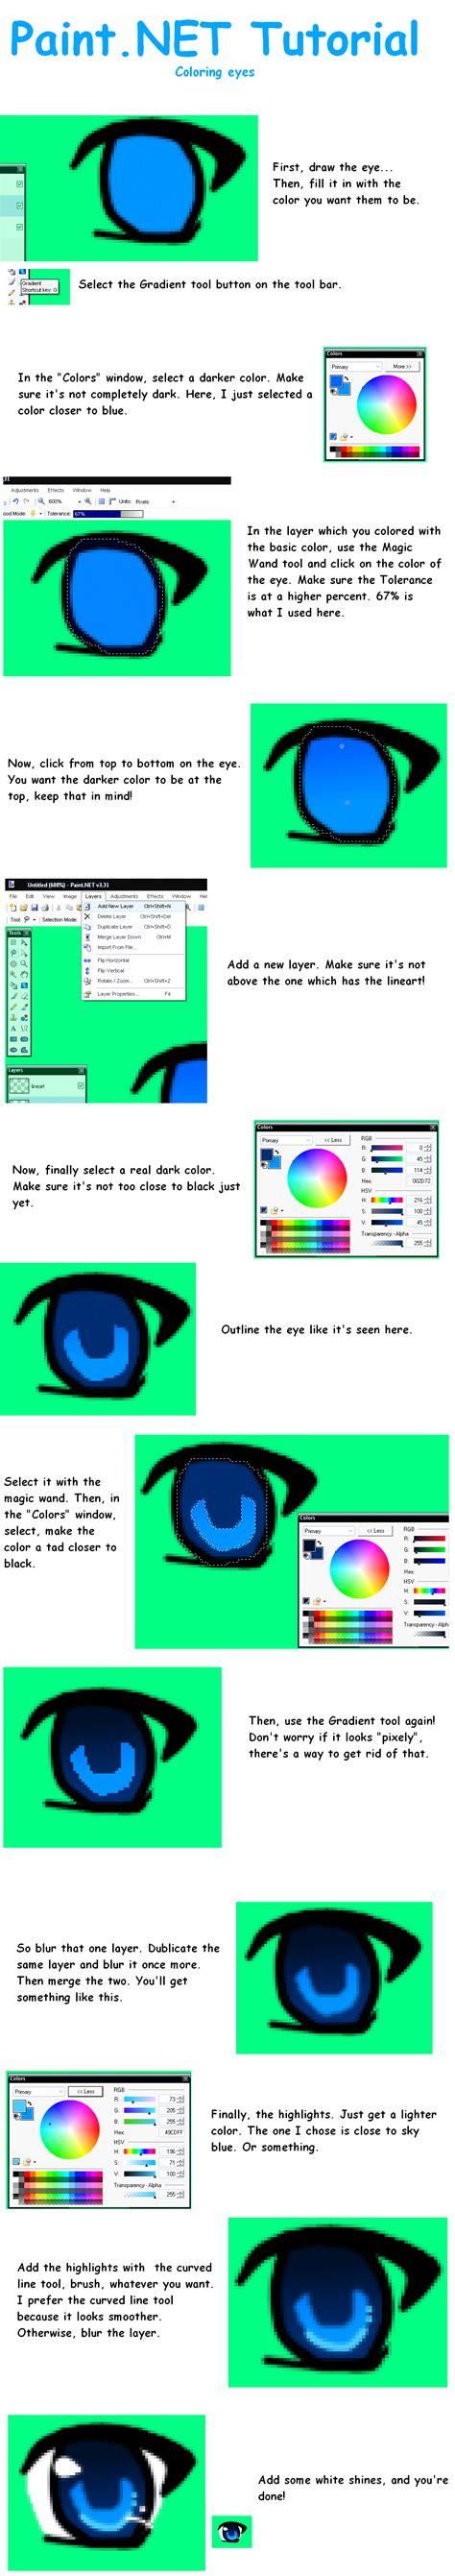 paint net eye tutorial 2 by angelthehedgehog on deviantart